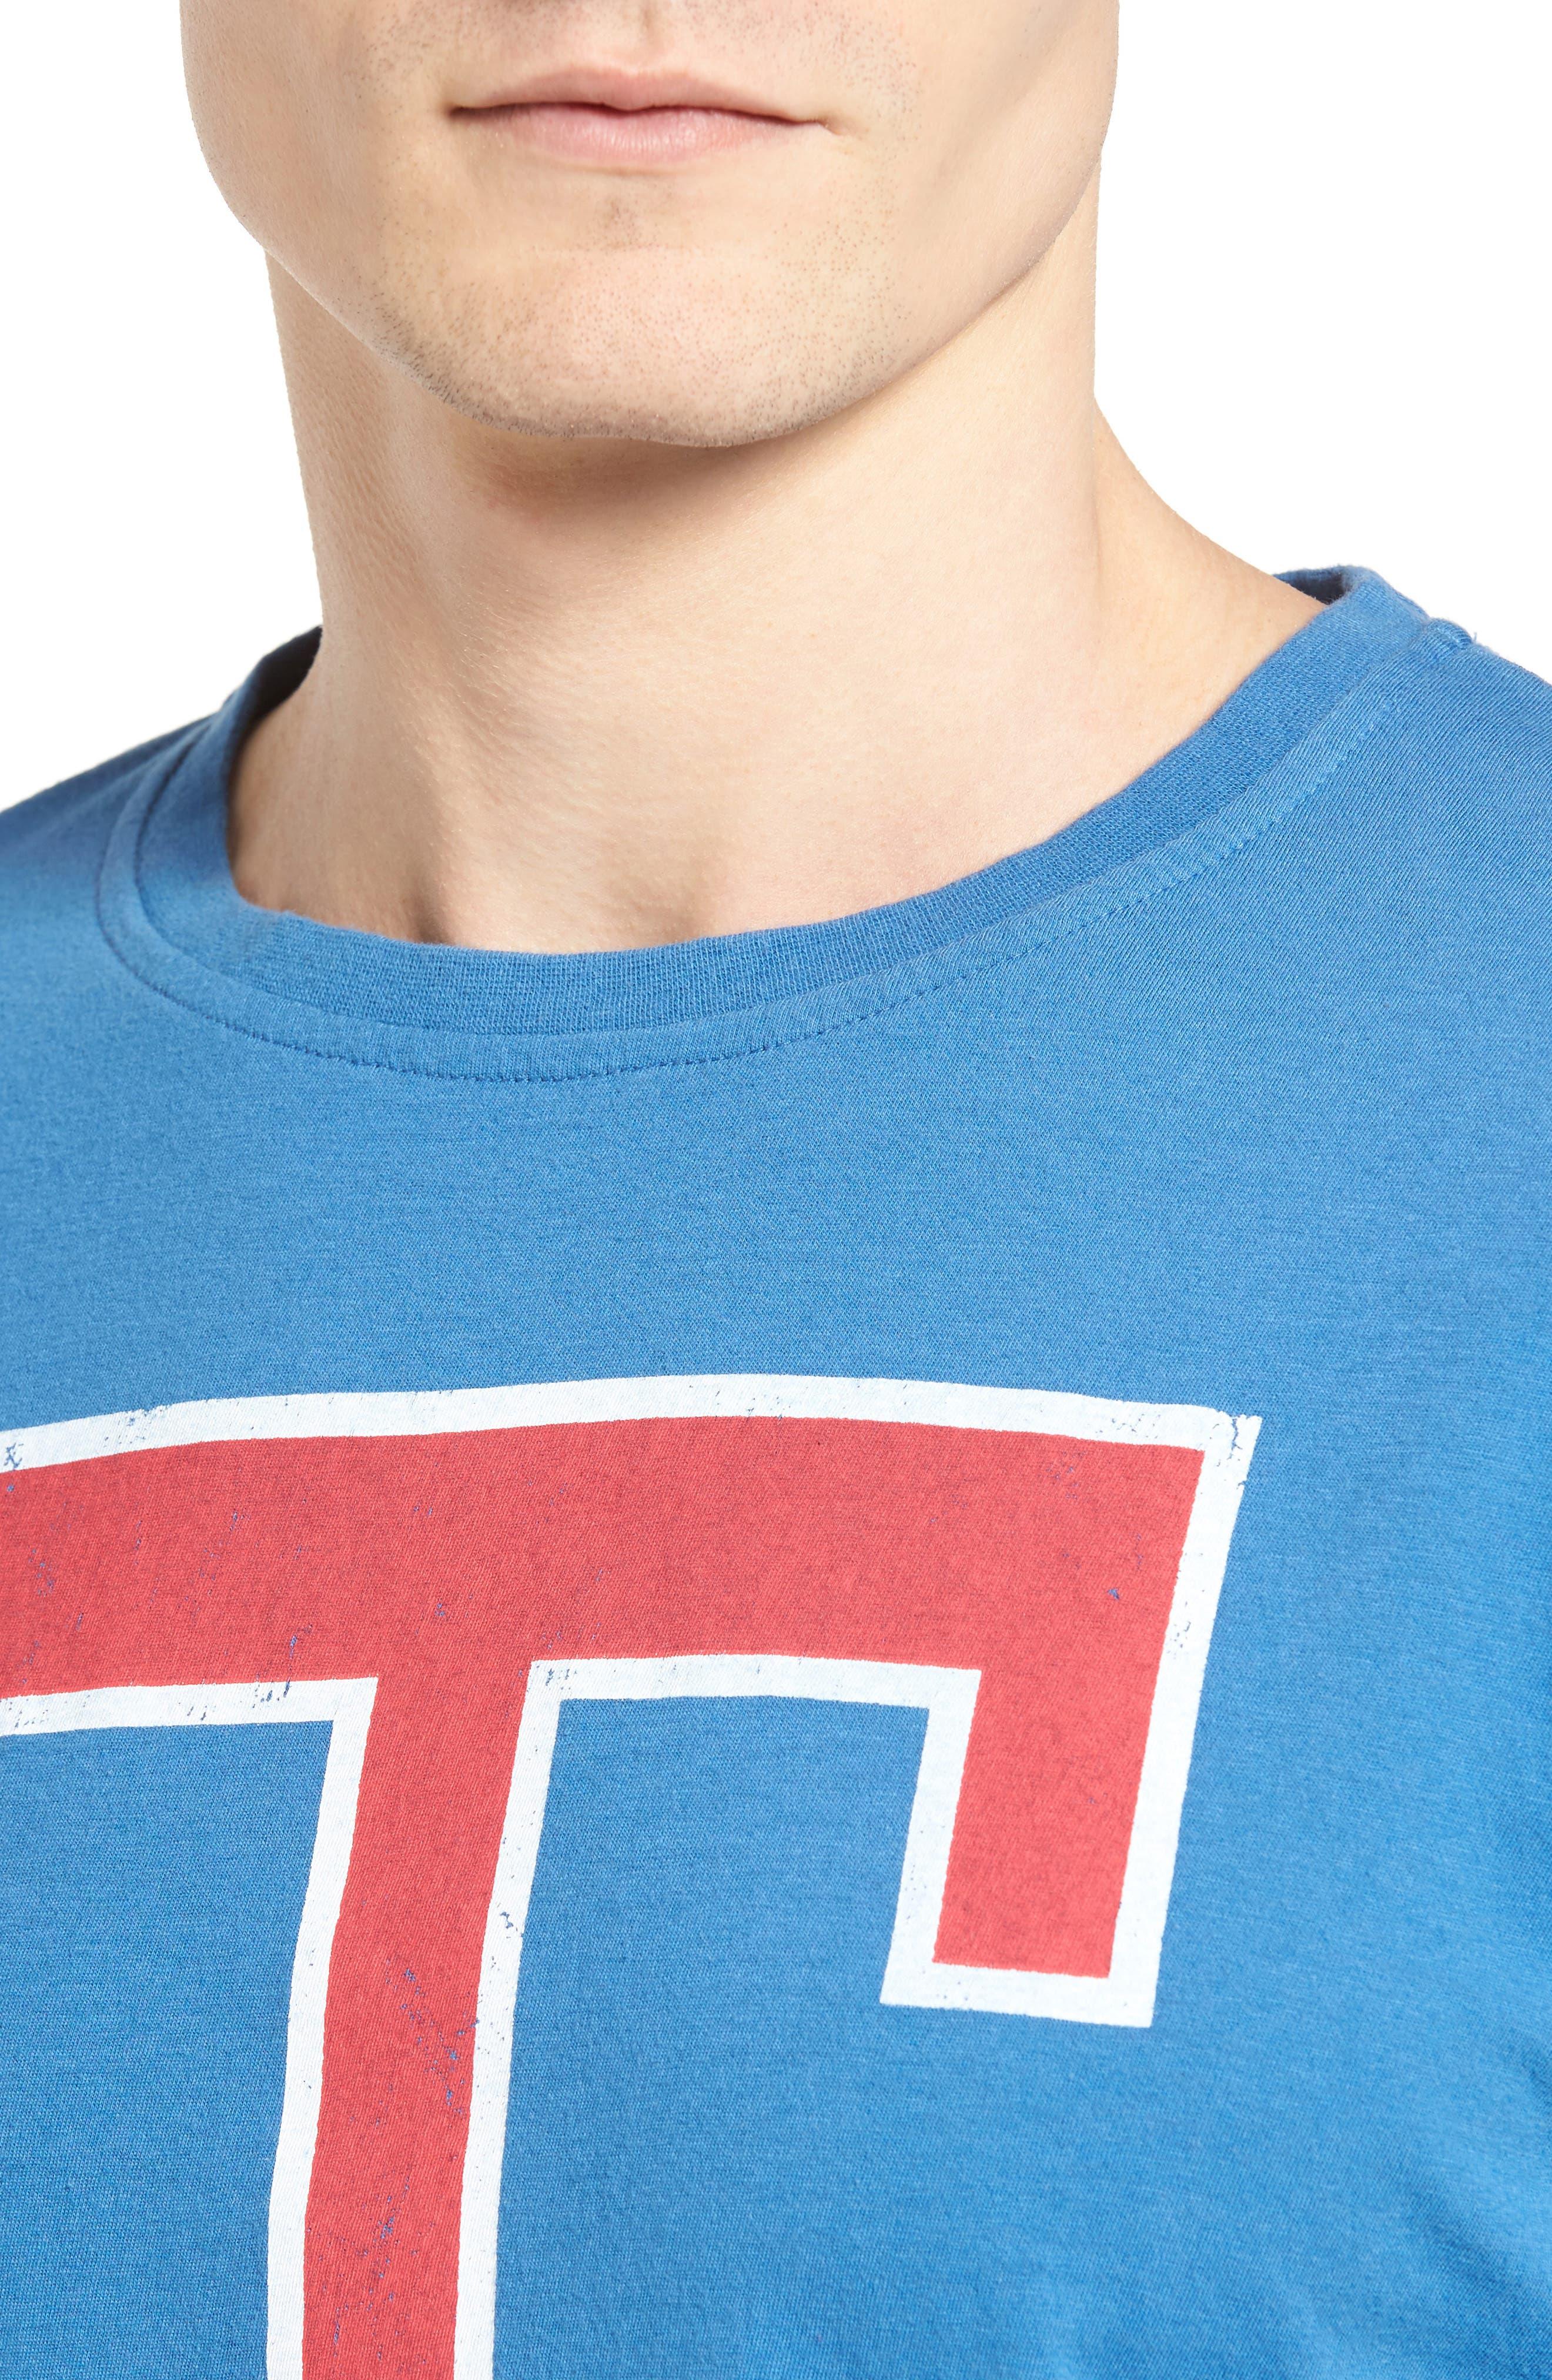 Brass Tack Texas Rangers T-Shirt,                             Alternate thumbnail 4, color,                             450